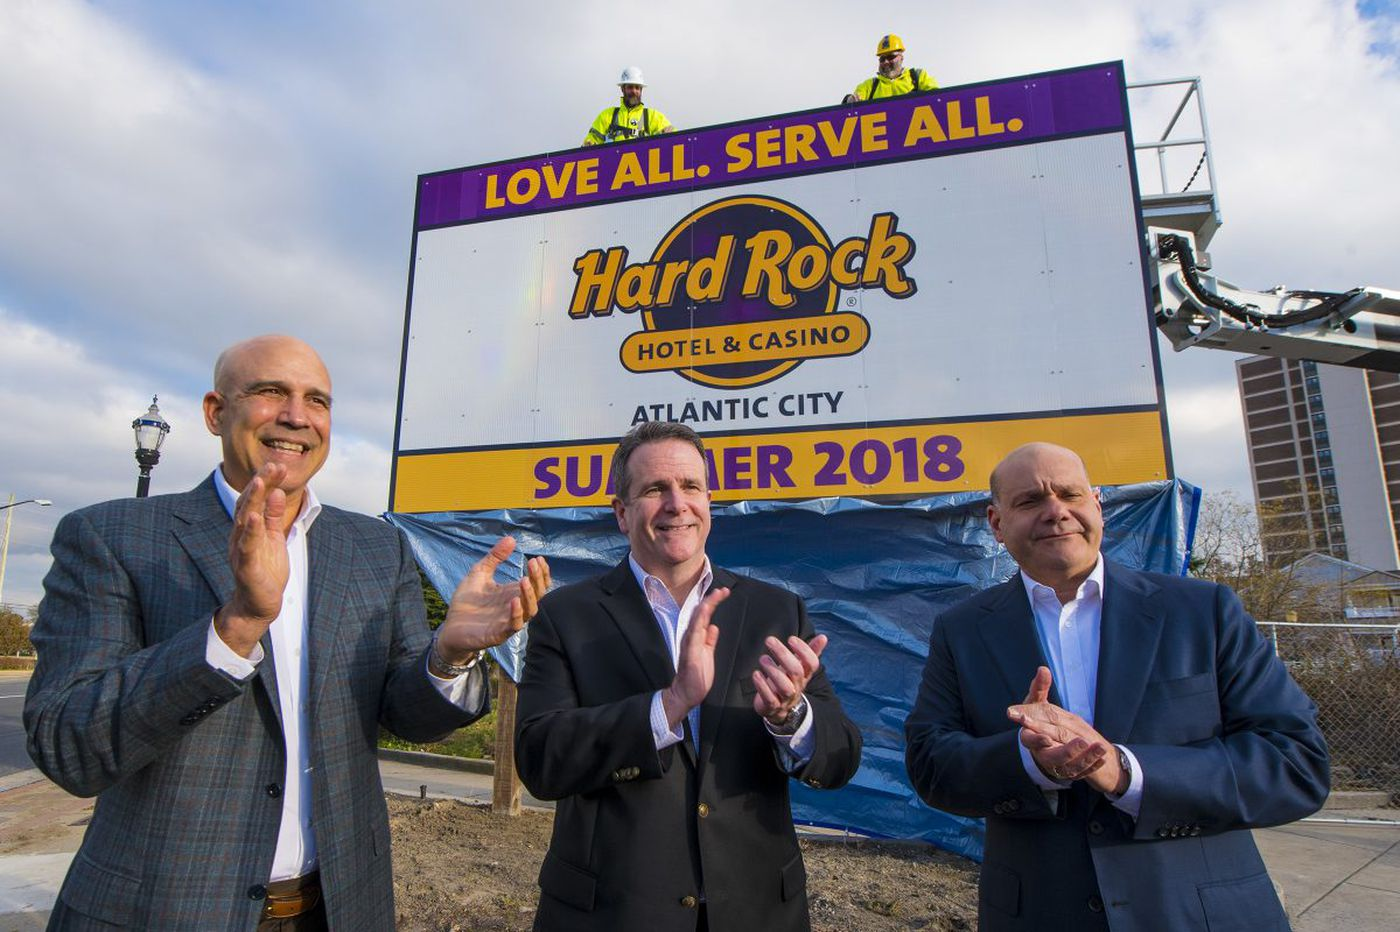 Hard Rock Casino finally unveils something in Atlantic City